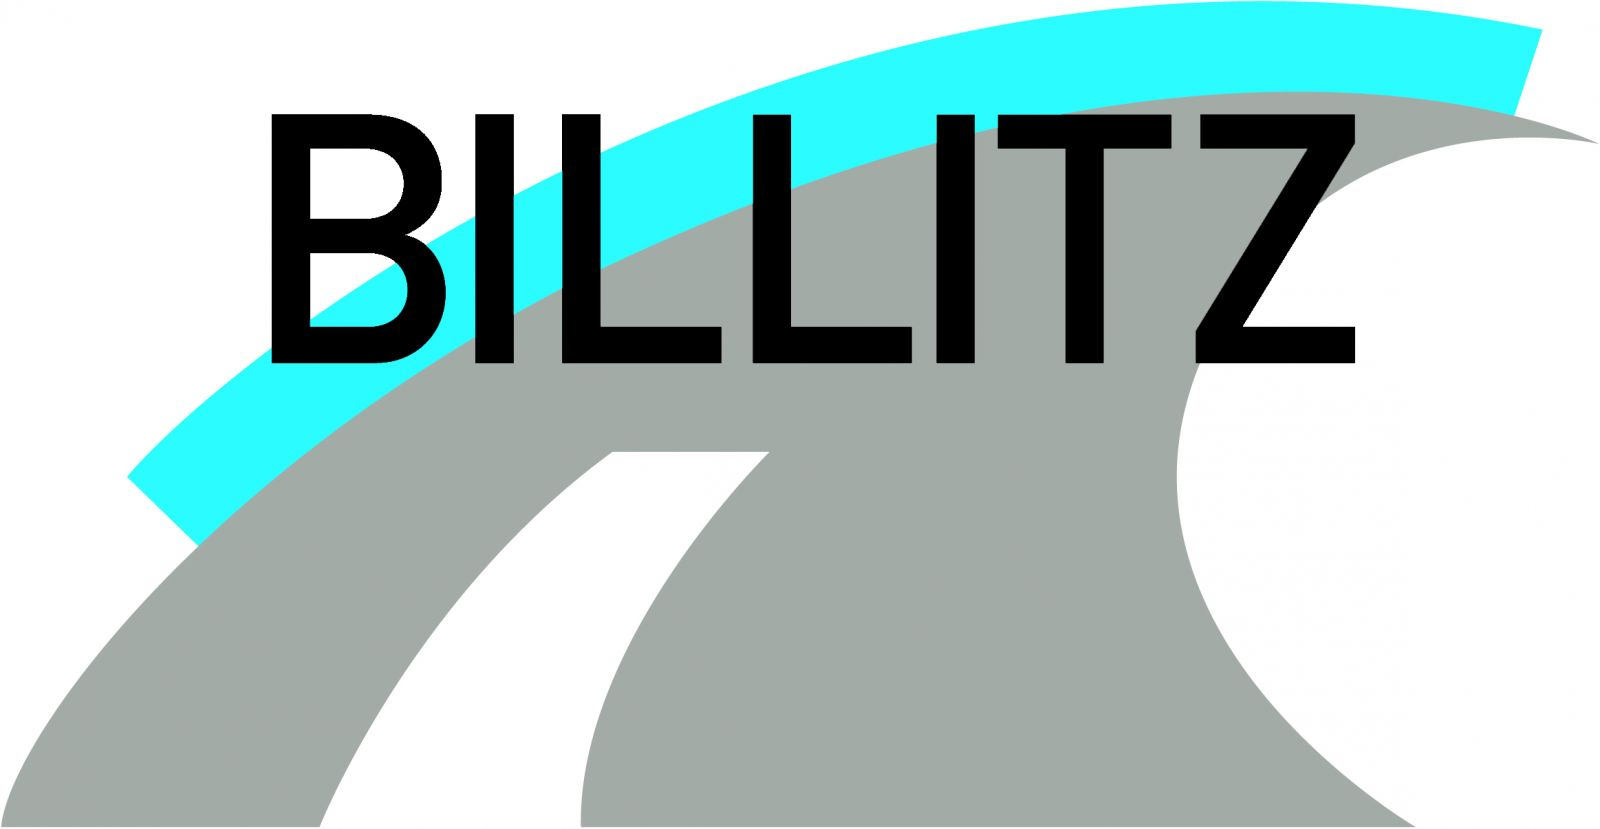 Alessandro Billitz Nfg. GmbH